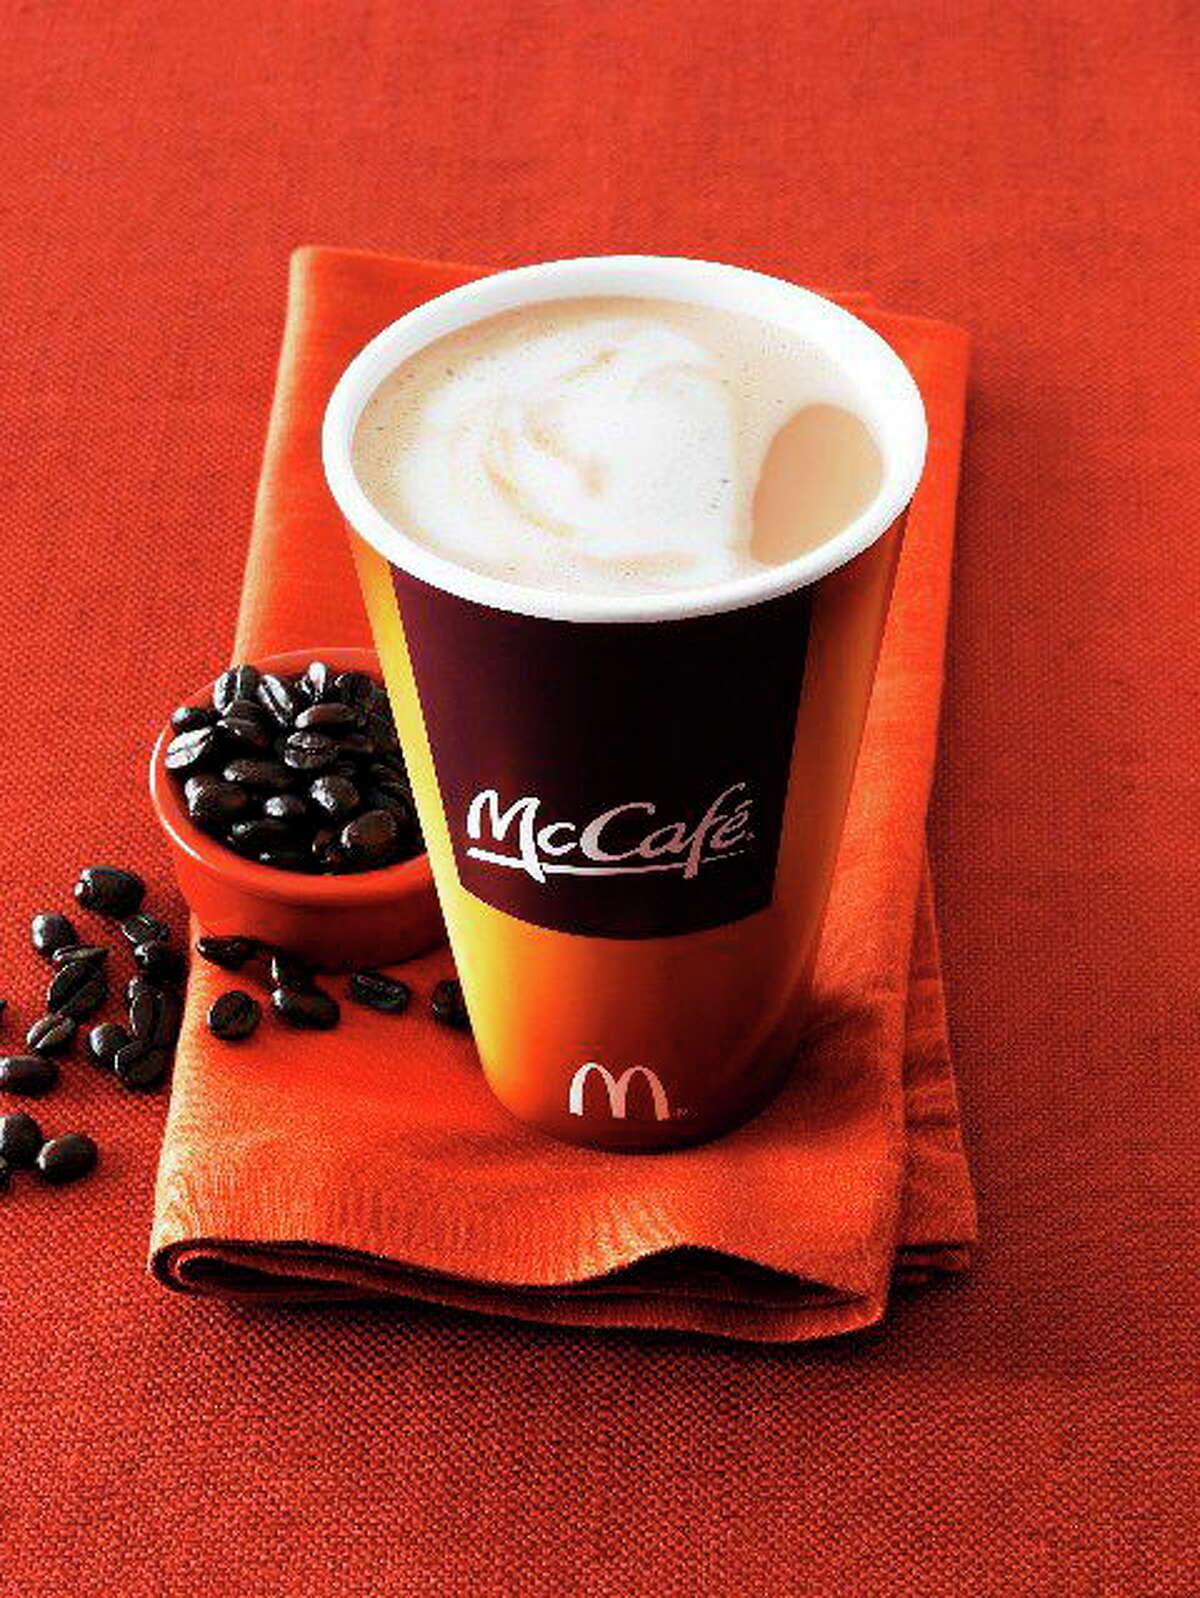 McCafe Latte on napkin